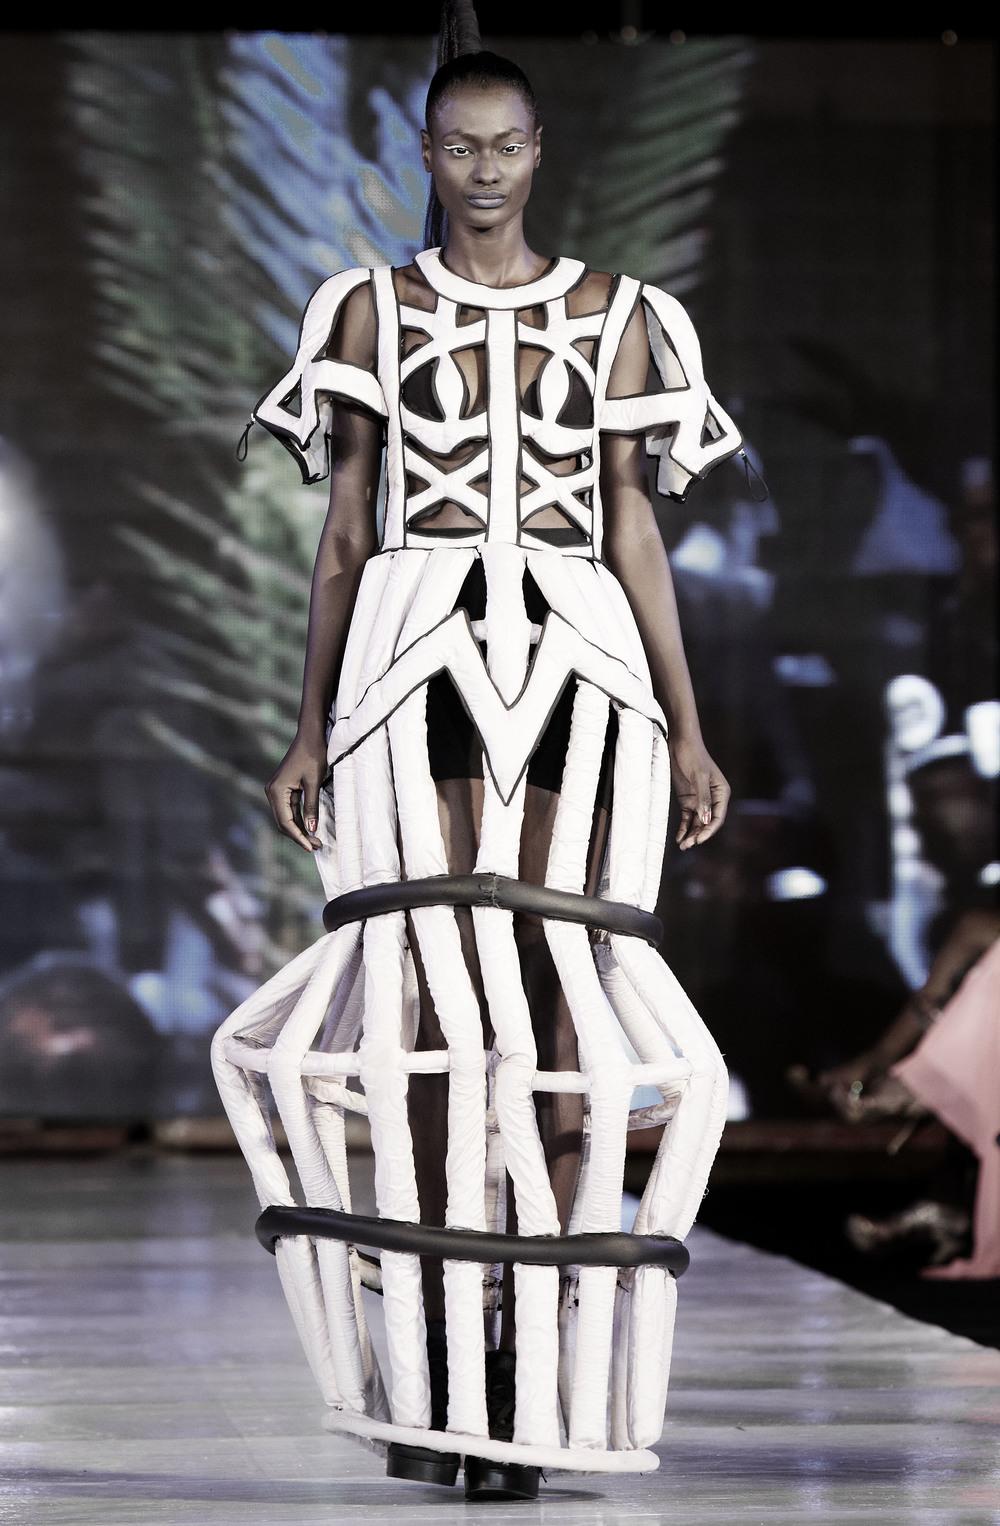 Dakar Fashion Week 2015 Designer: Seraka By Selly Raby Kane